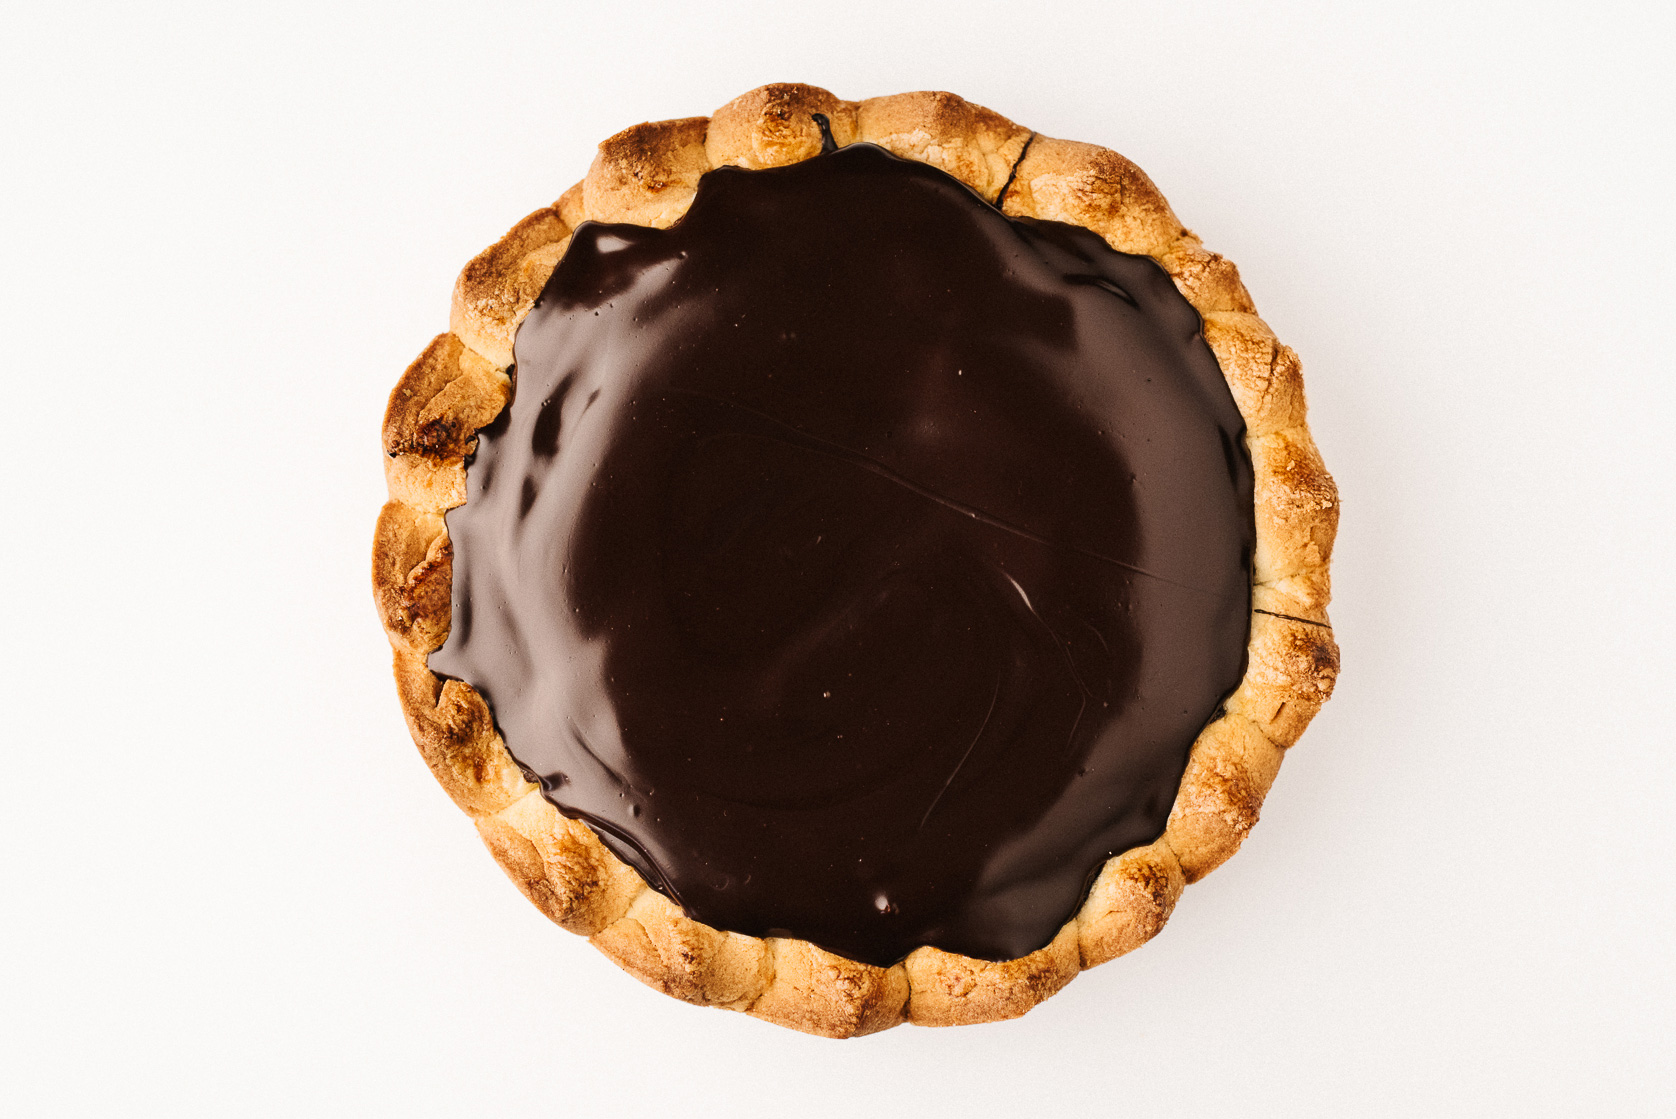 buralli-dolci-cioccolato